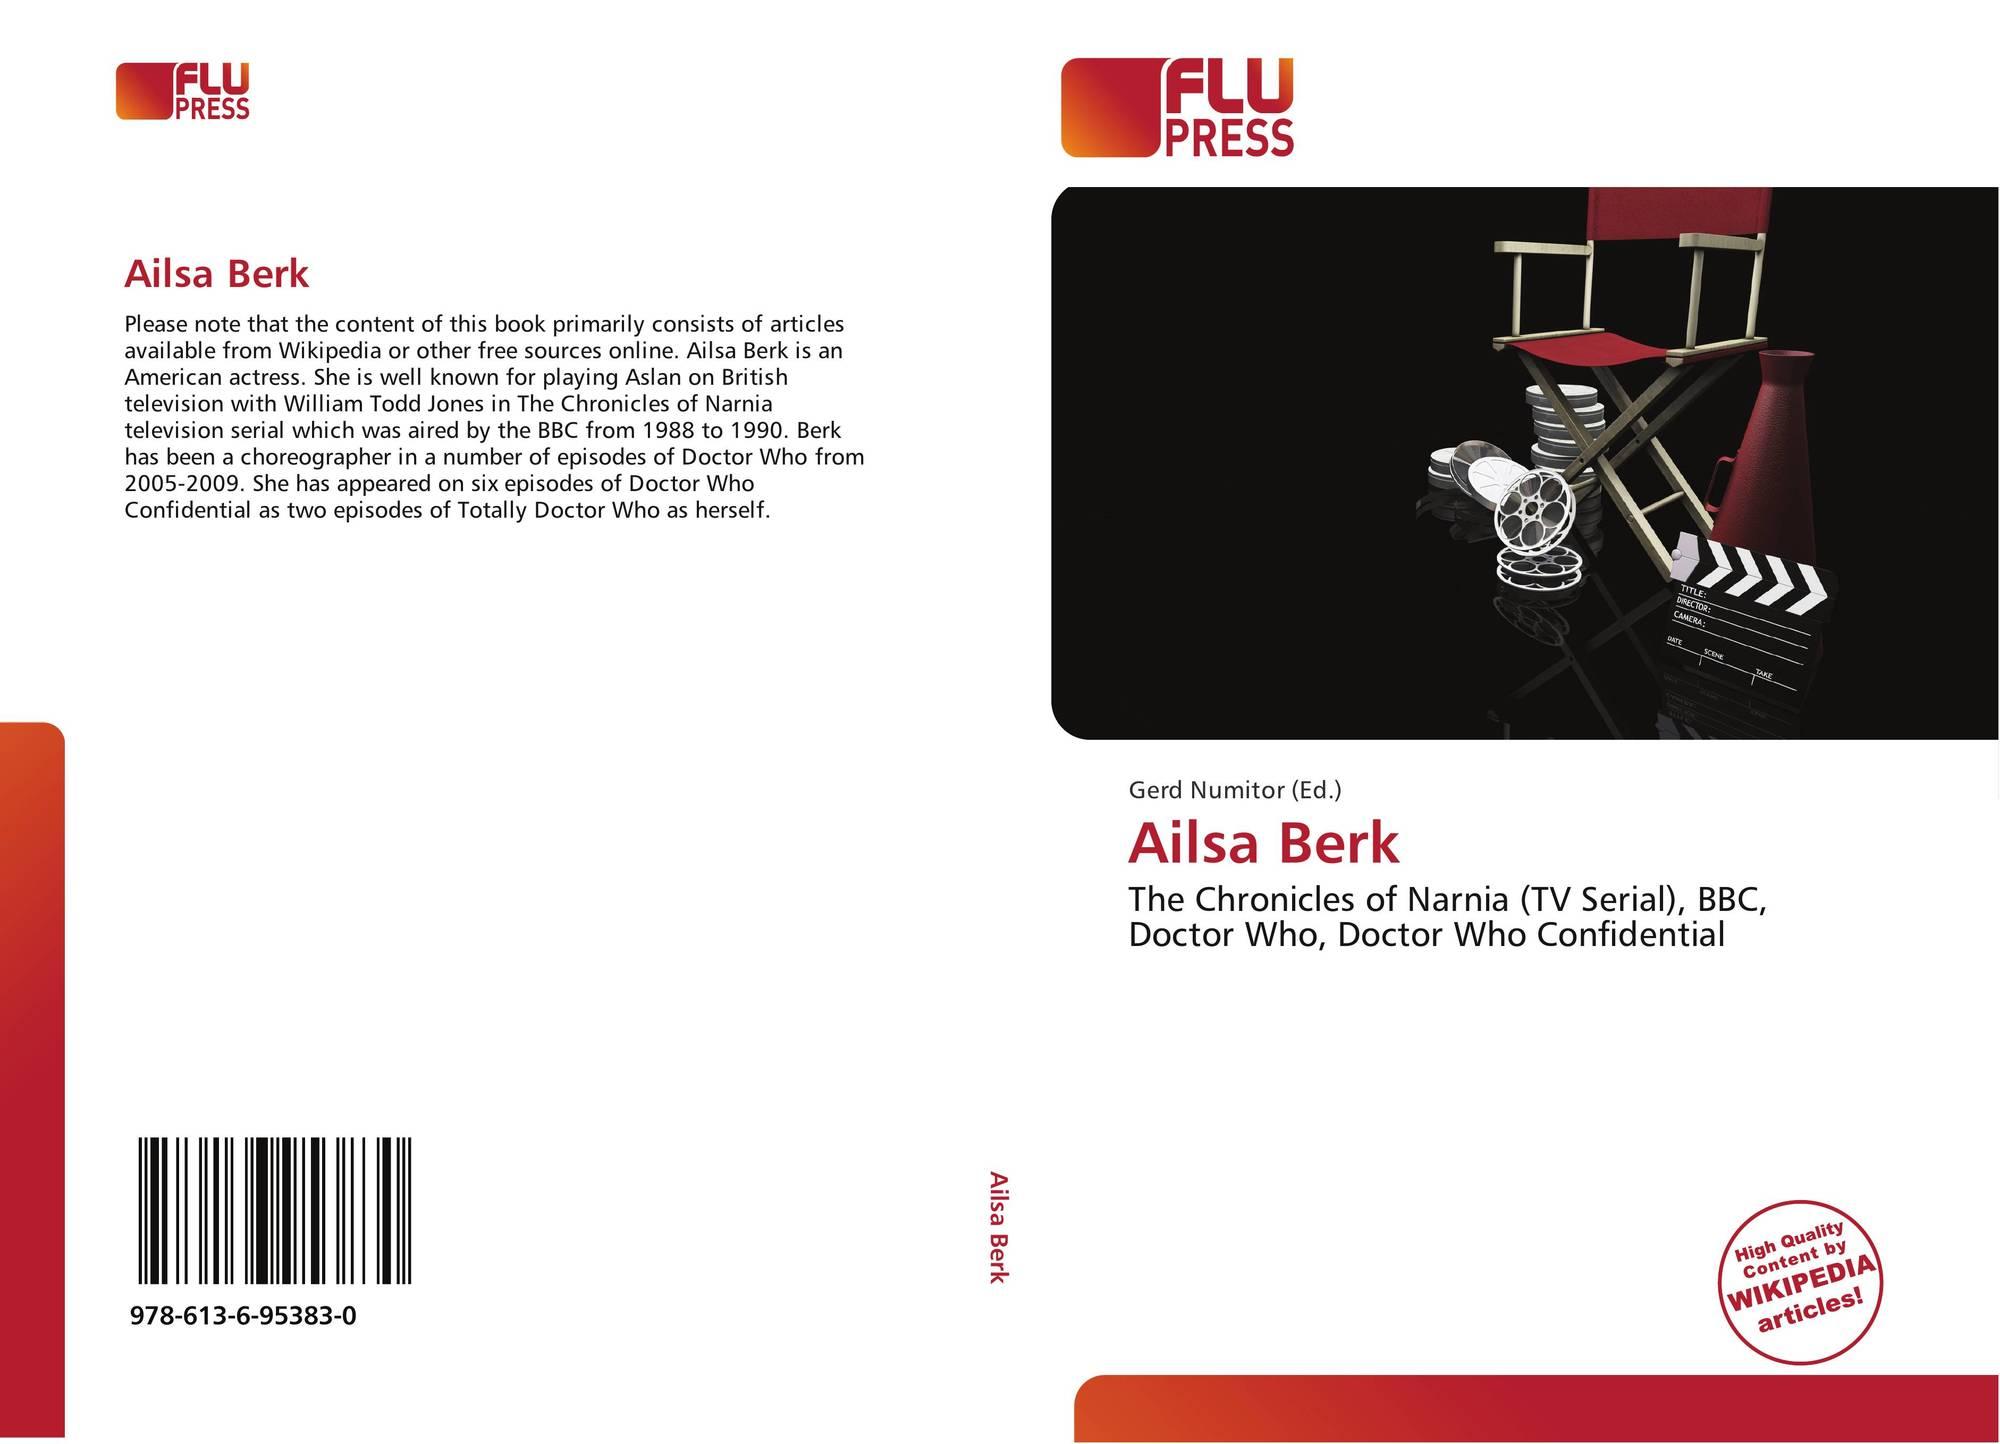 Forum on this topic: Marina Suma, ailsa-berk/